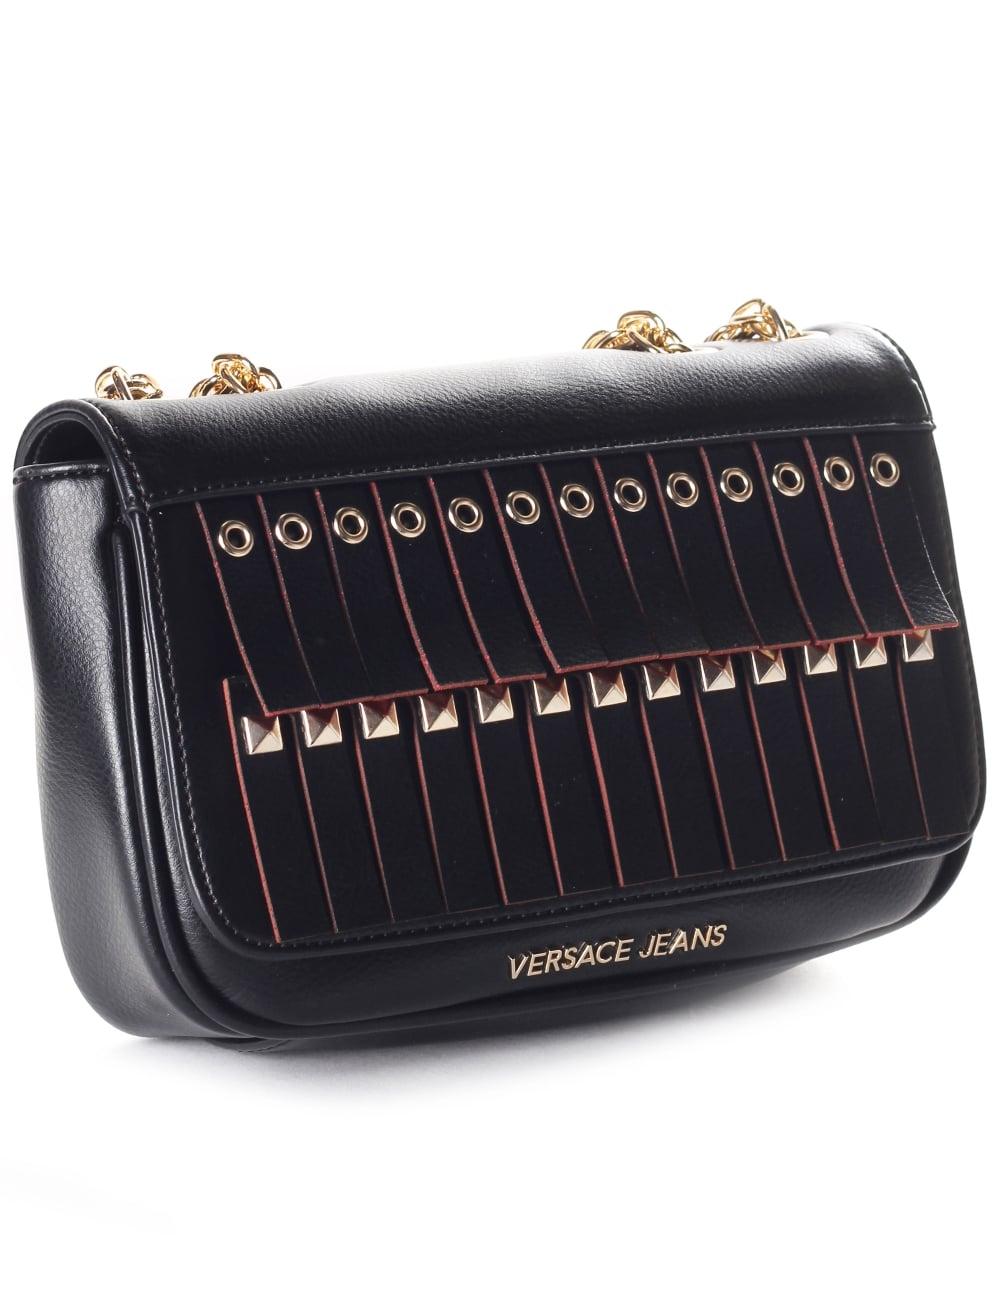 Versace Jeans Chain Strap Women s Tassel Crossbody Bag Black 30d964e73b405